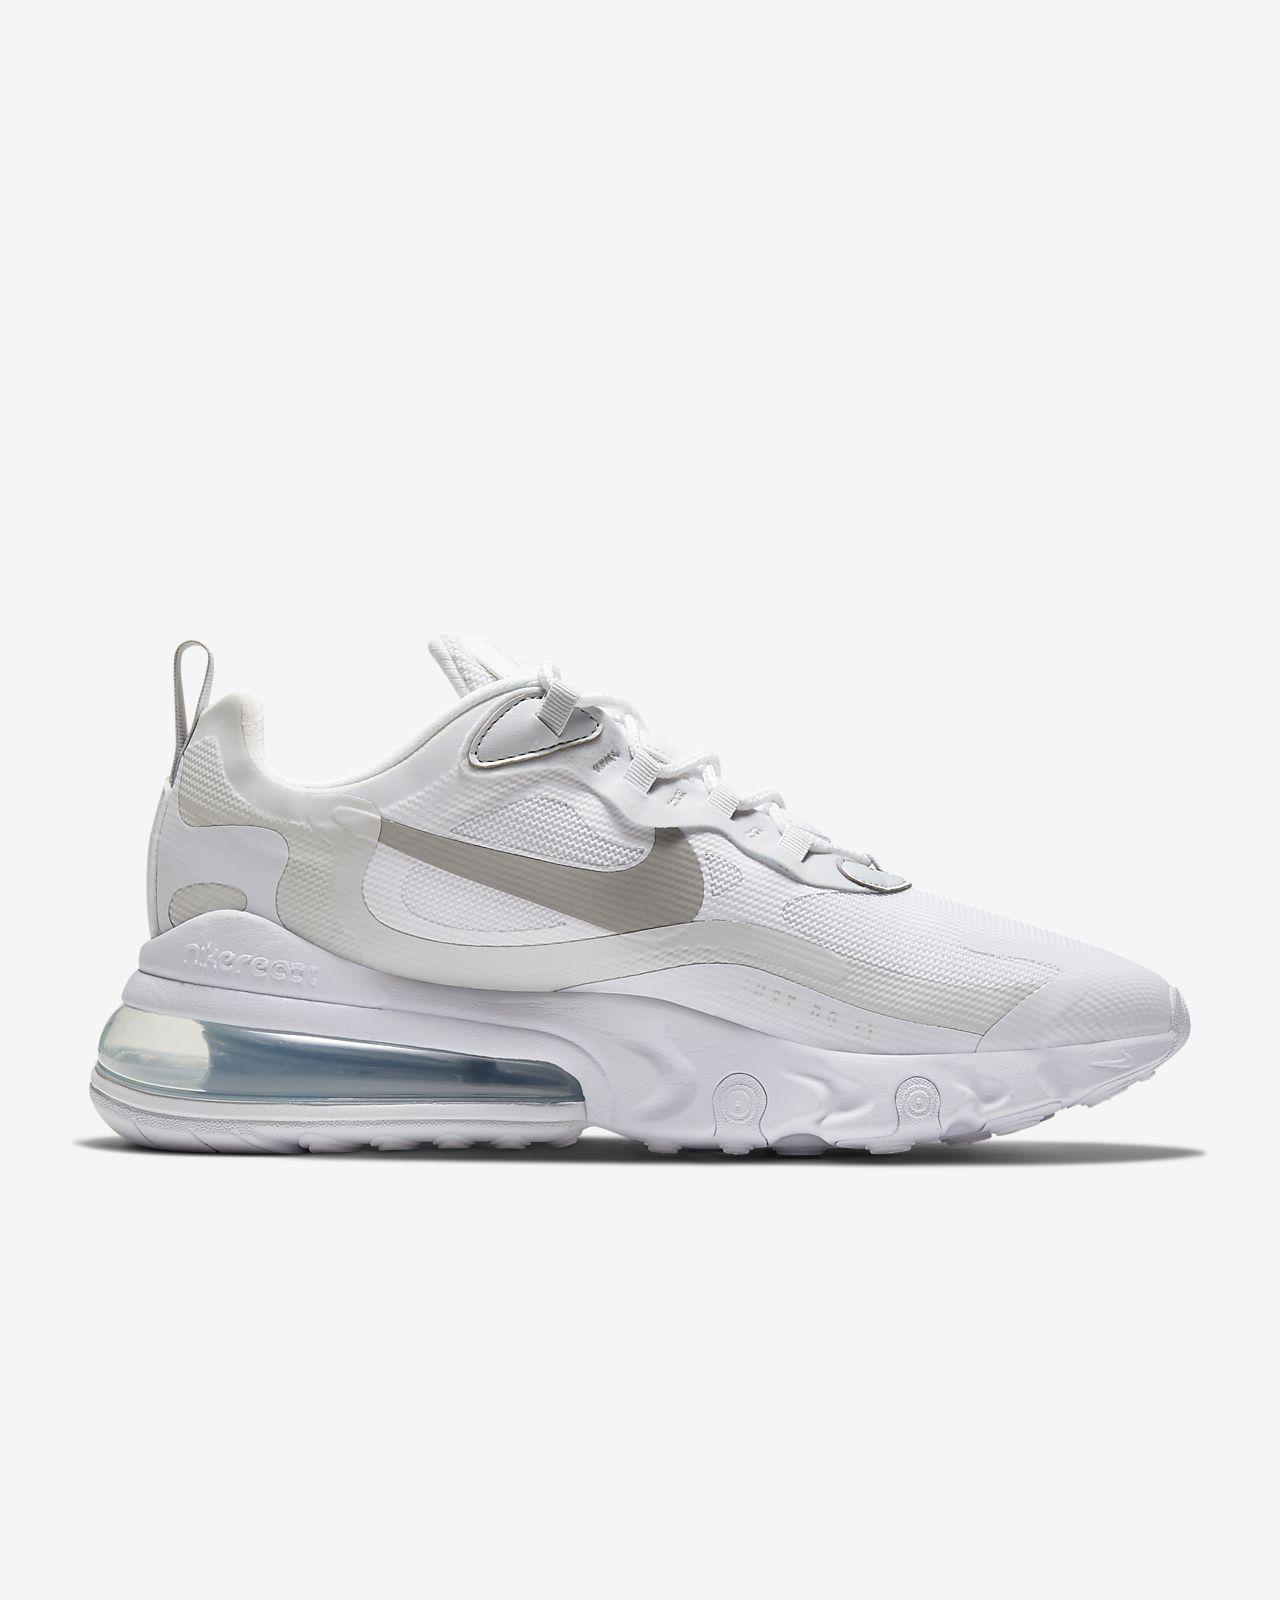 Nike Air Max 270 SE white platinum white grey, 43